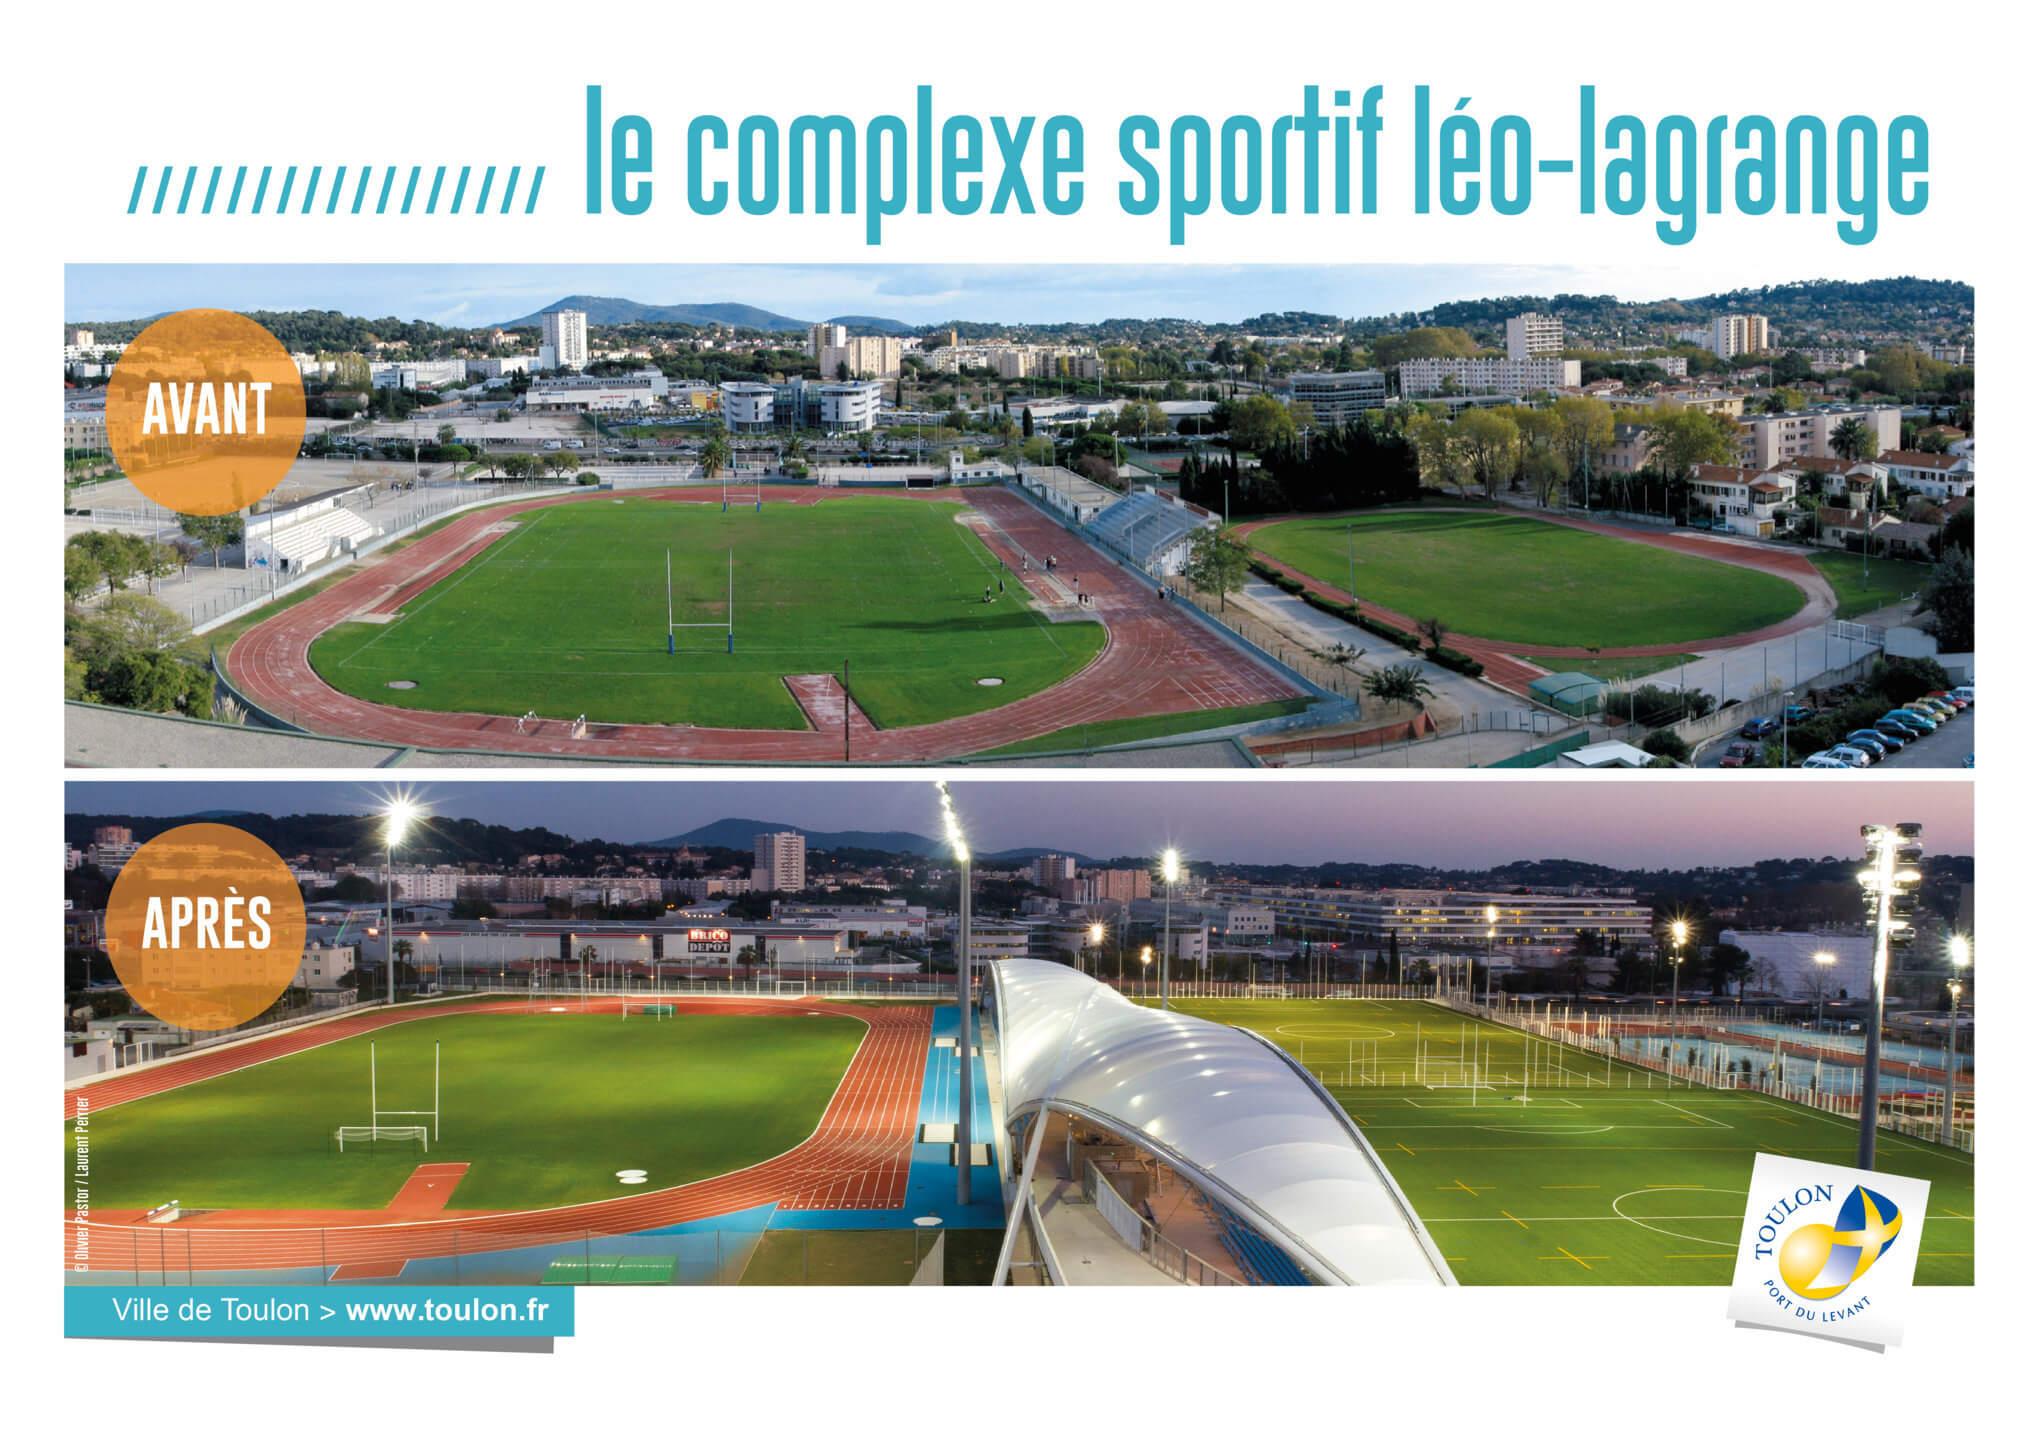 Le complexe sportif léo-lagrange